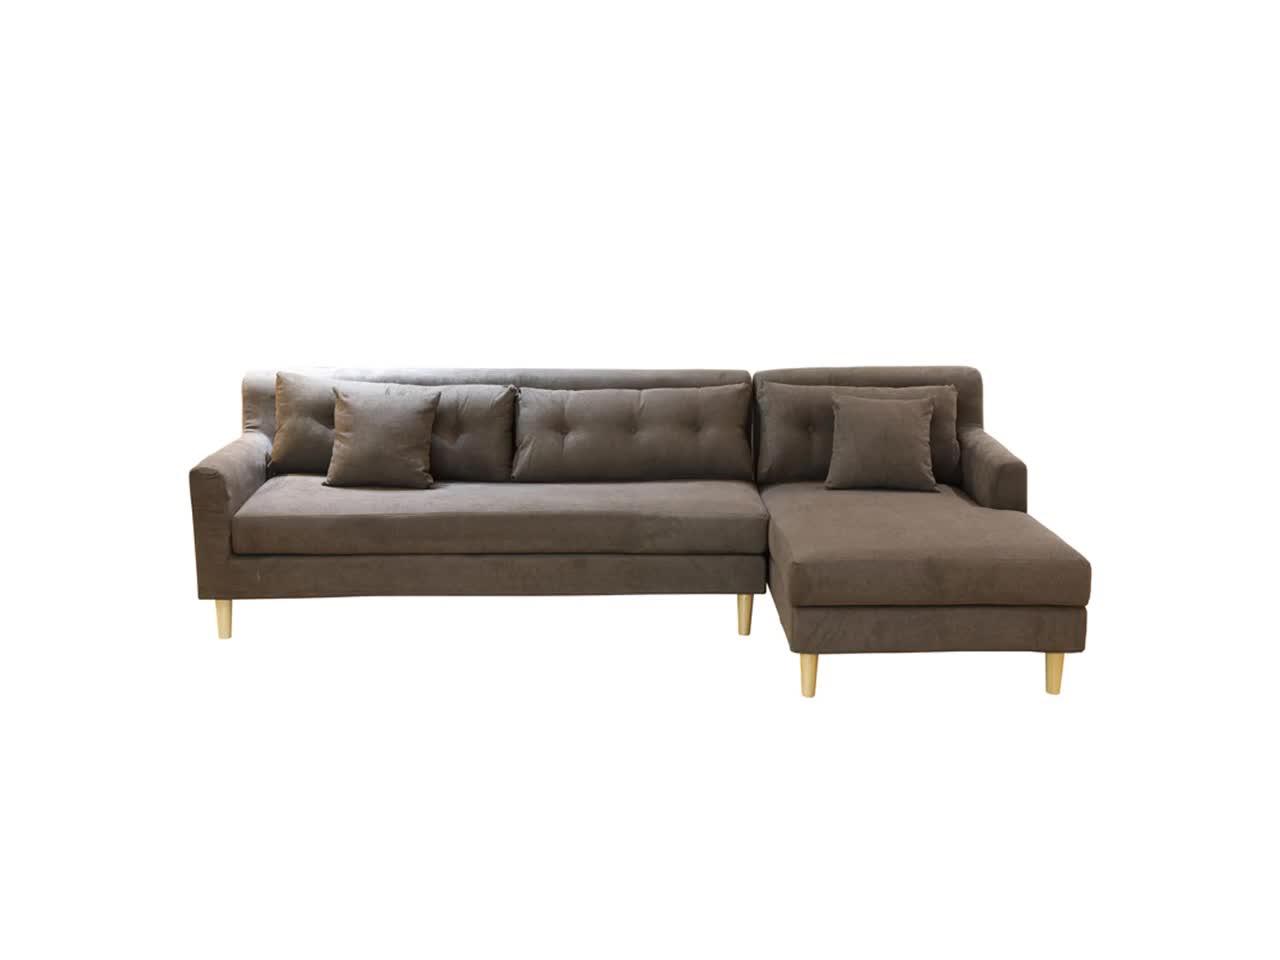 latest design corner sofa set simple of wooden 2019 modern new l shape fabric buy